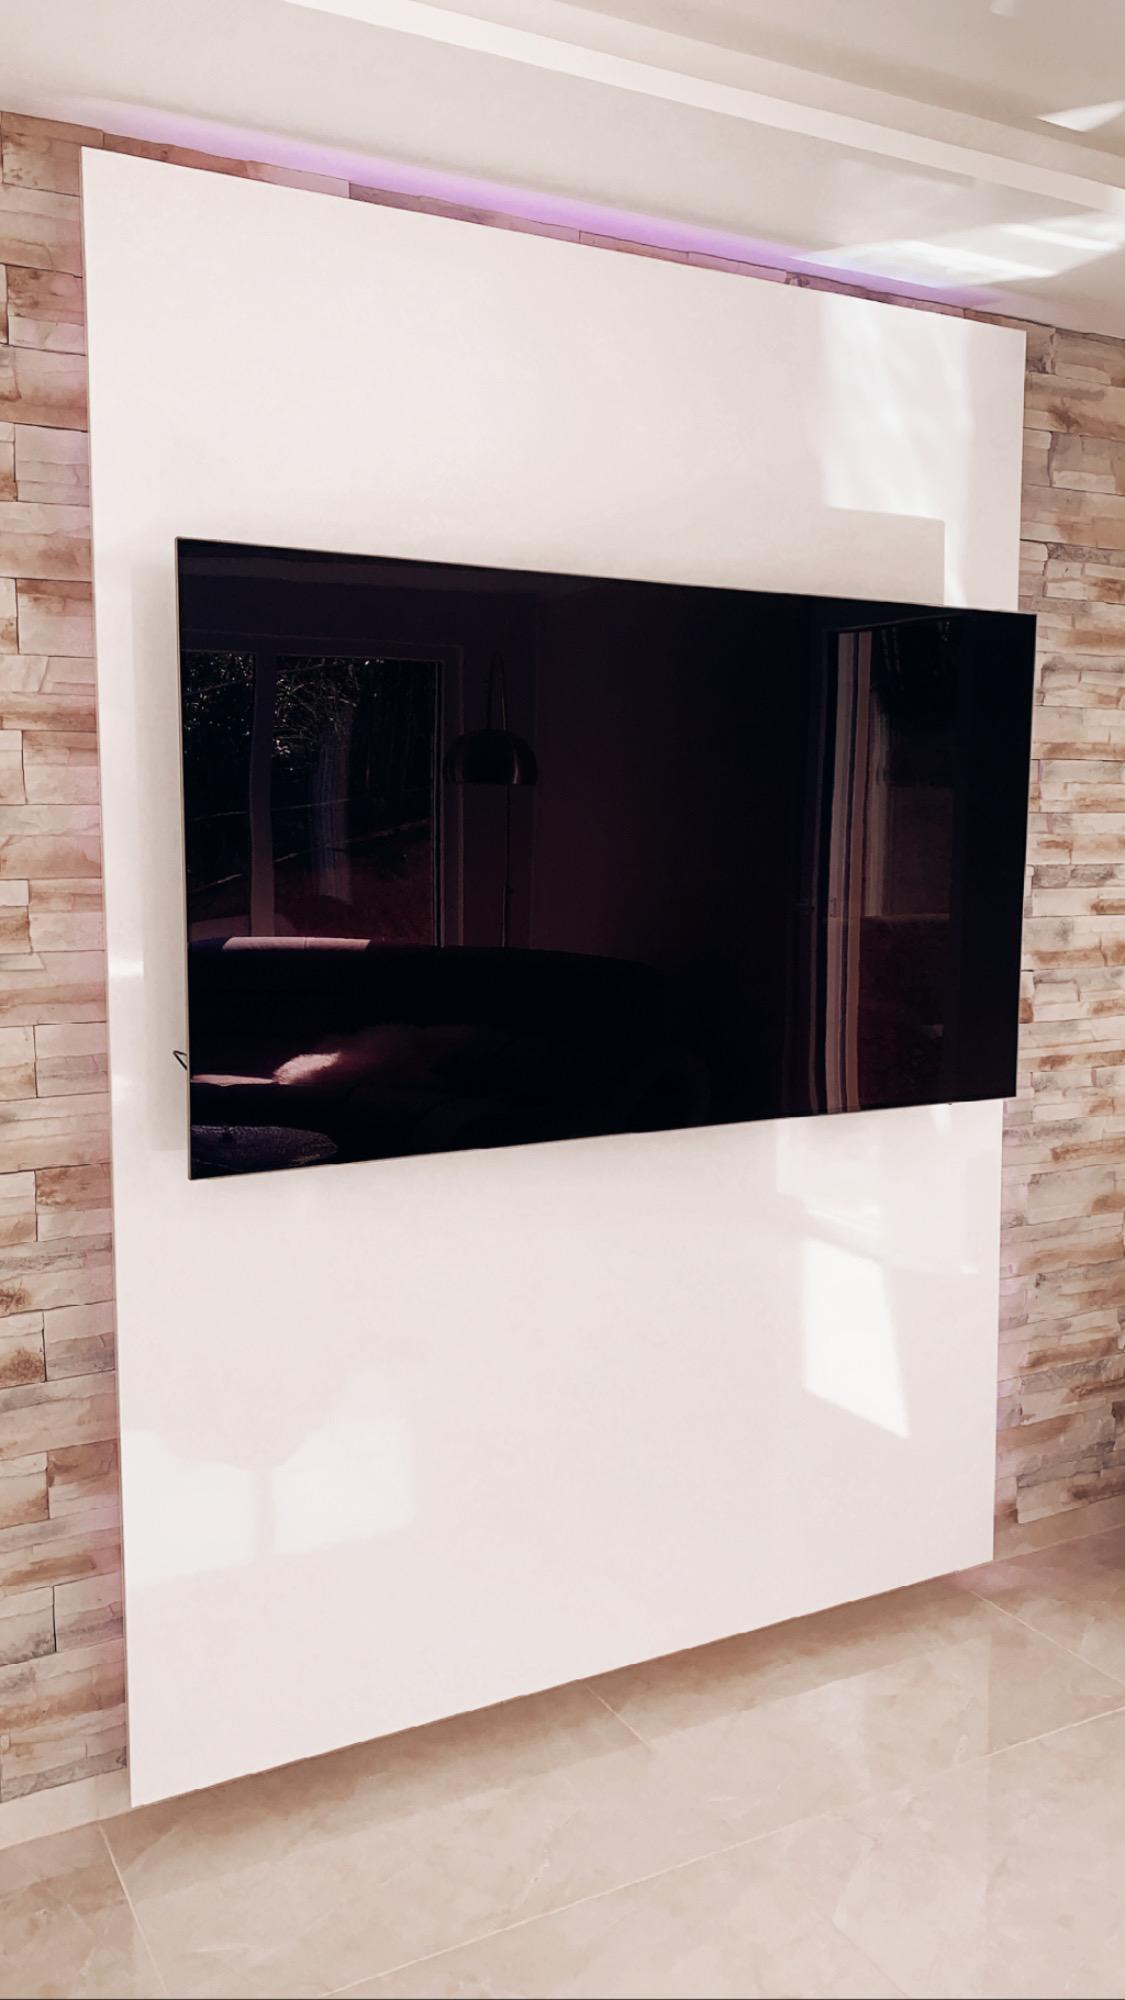 Geradlinige und edle TV-Wand: TV WALL Individual in Hochglanz ...